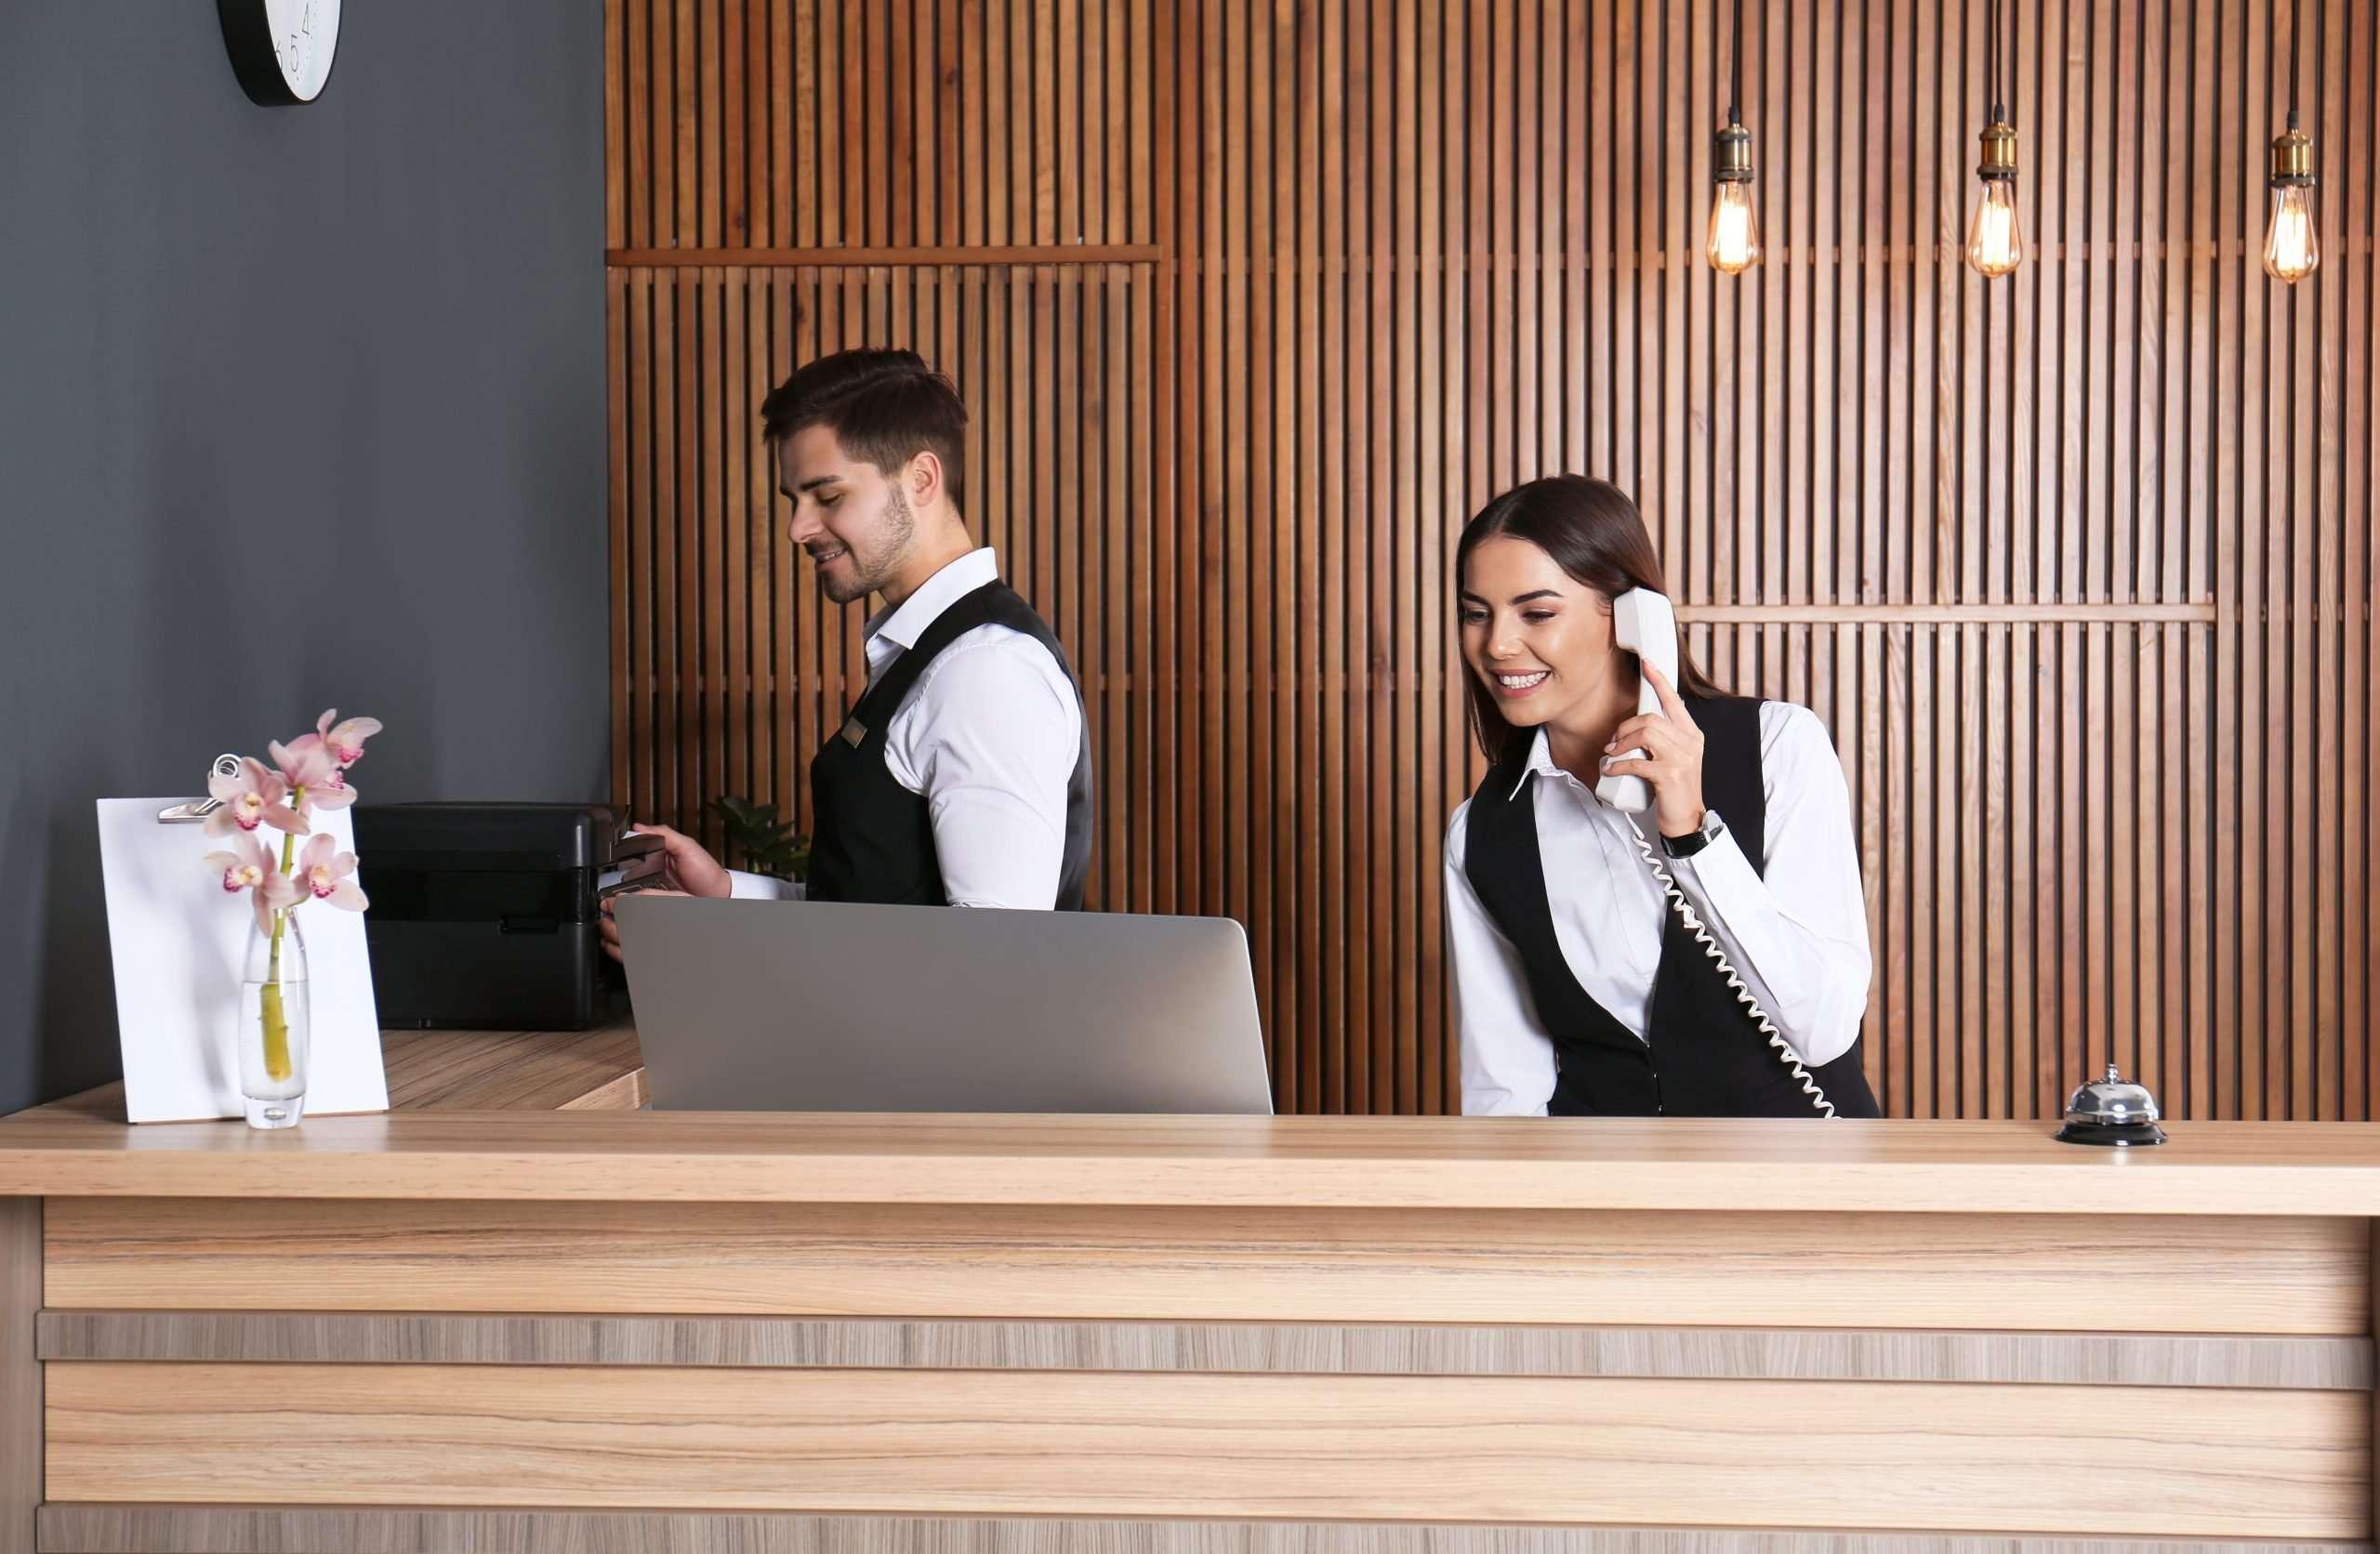 Receptionist answering calls